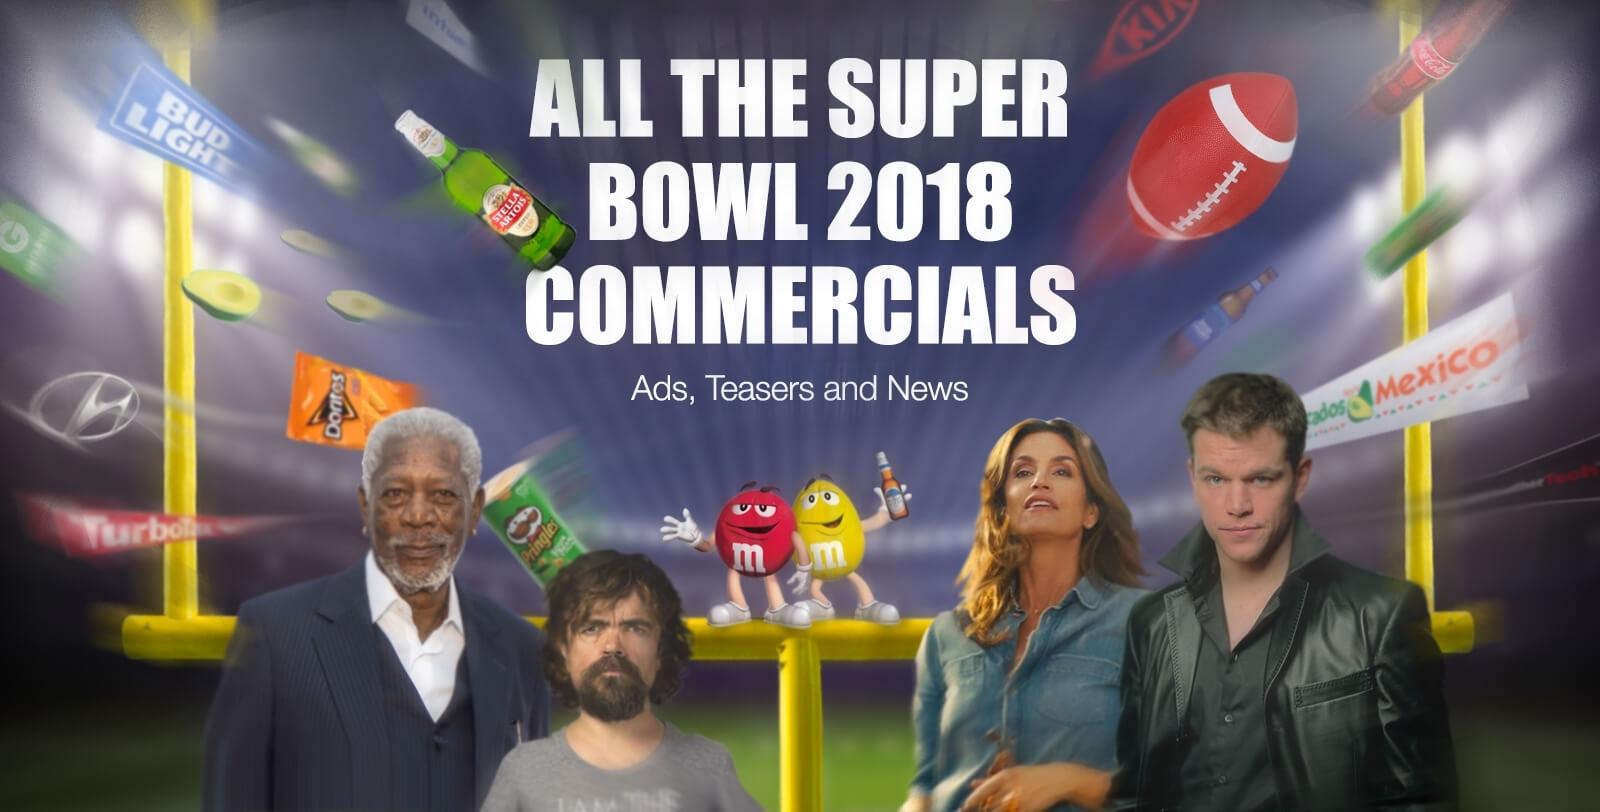 Super Bowl Commercials 2019   All Super Bowl Liii Ads with Super Bowl Ads 2018